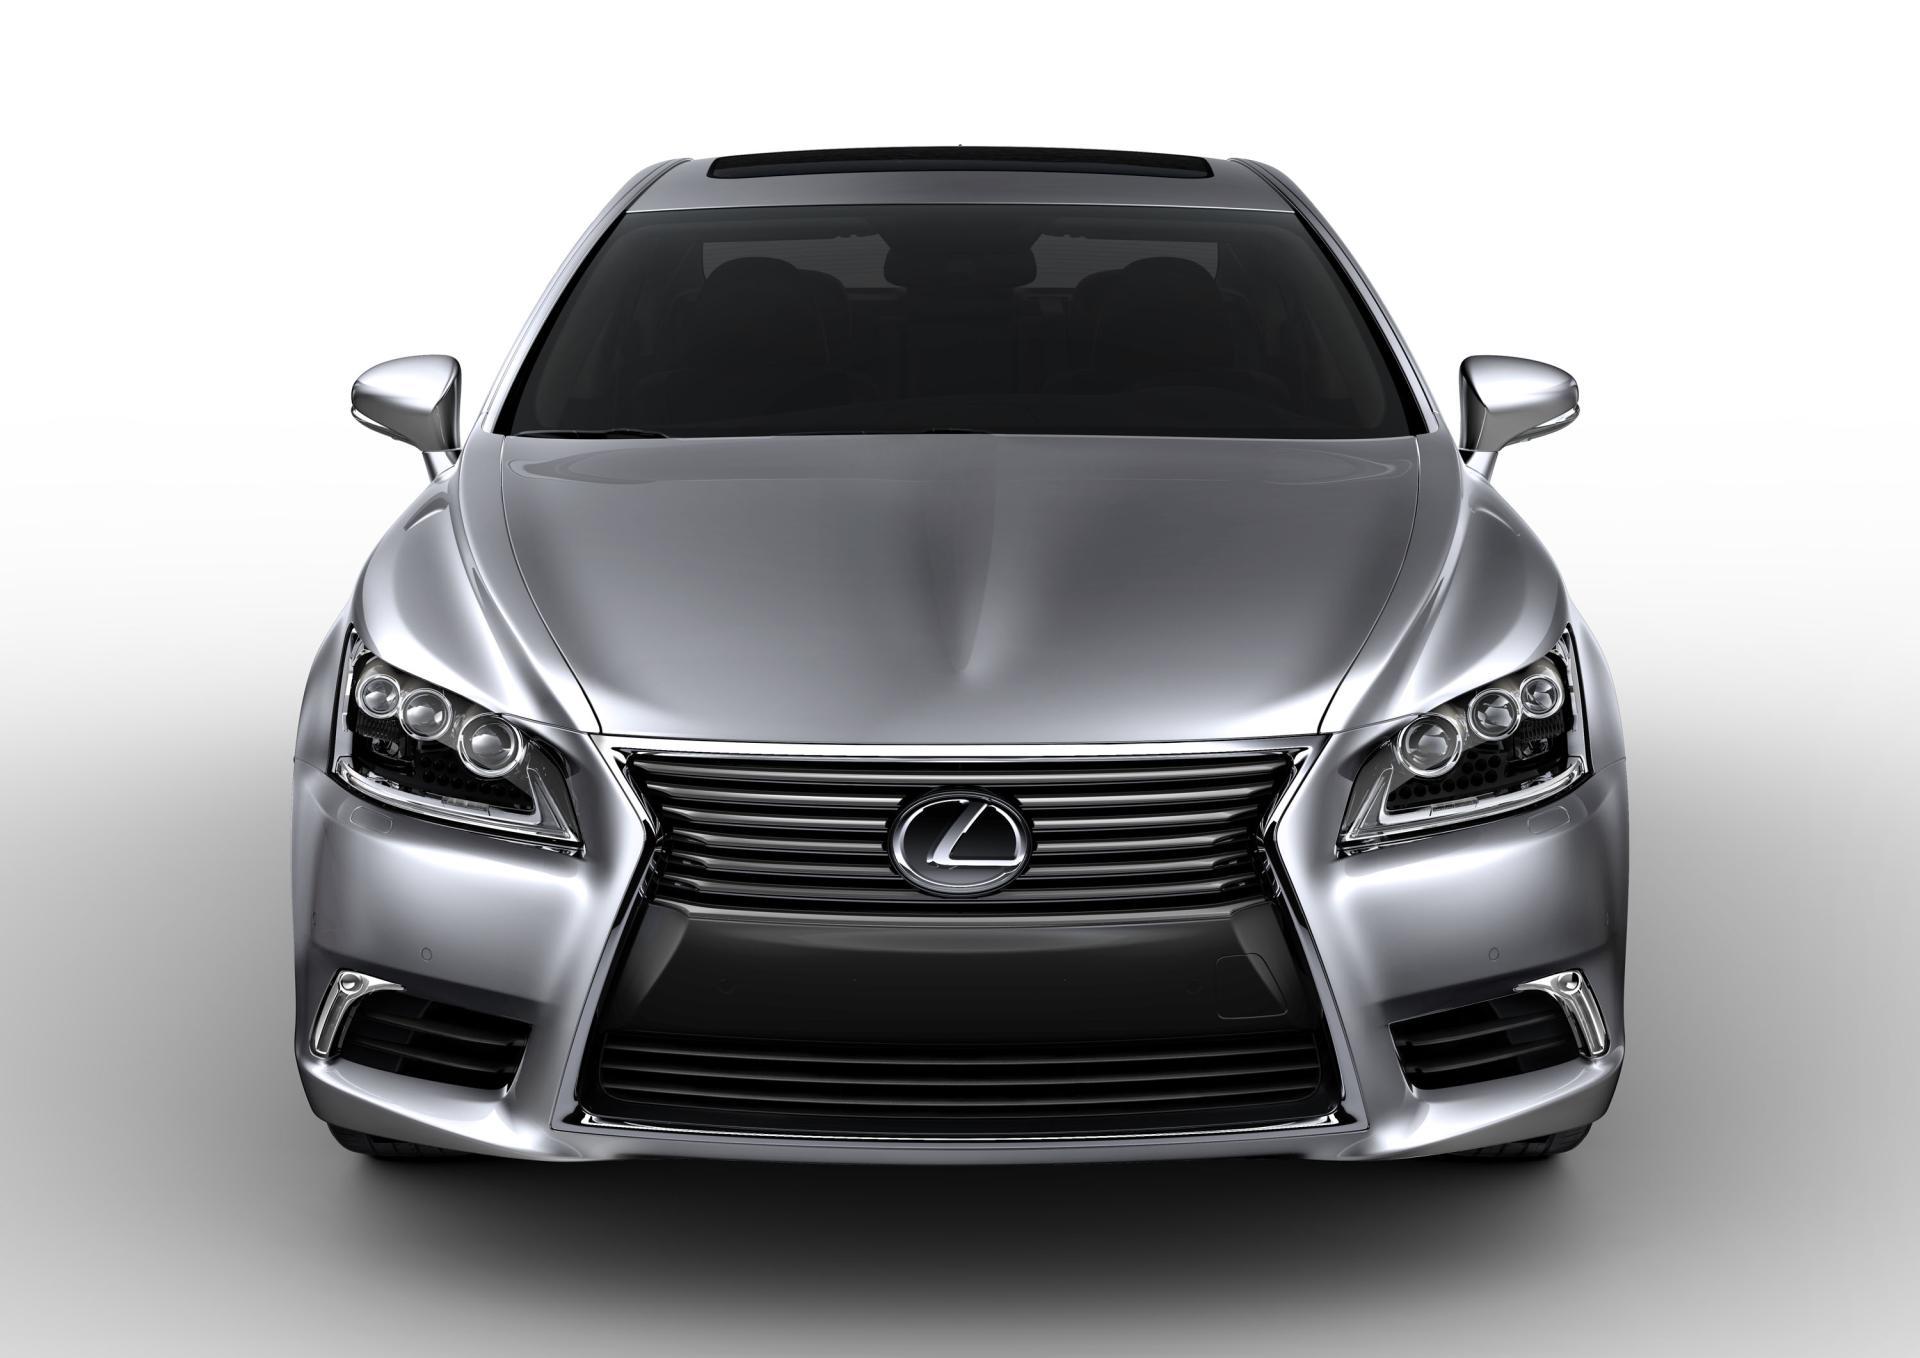 2014 Lexus LS conceptcarz